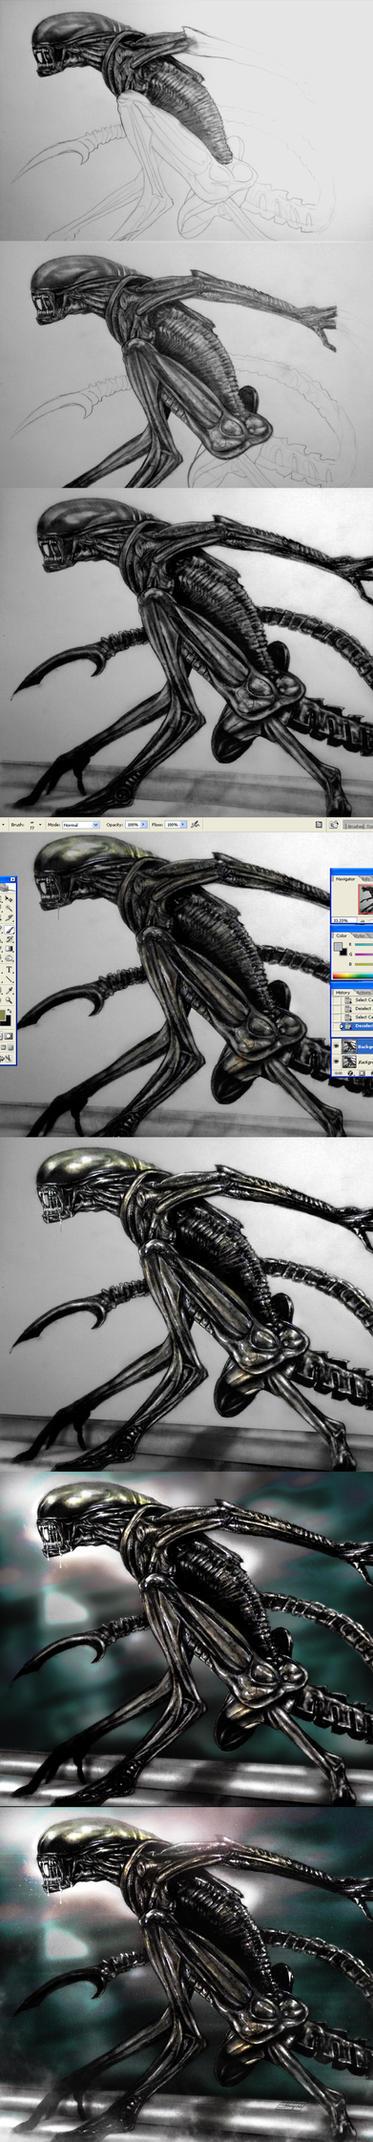 Xenomorph progressional by Art-by-Jilani